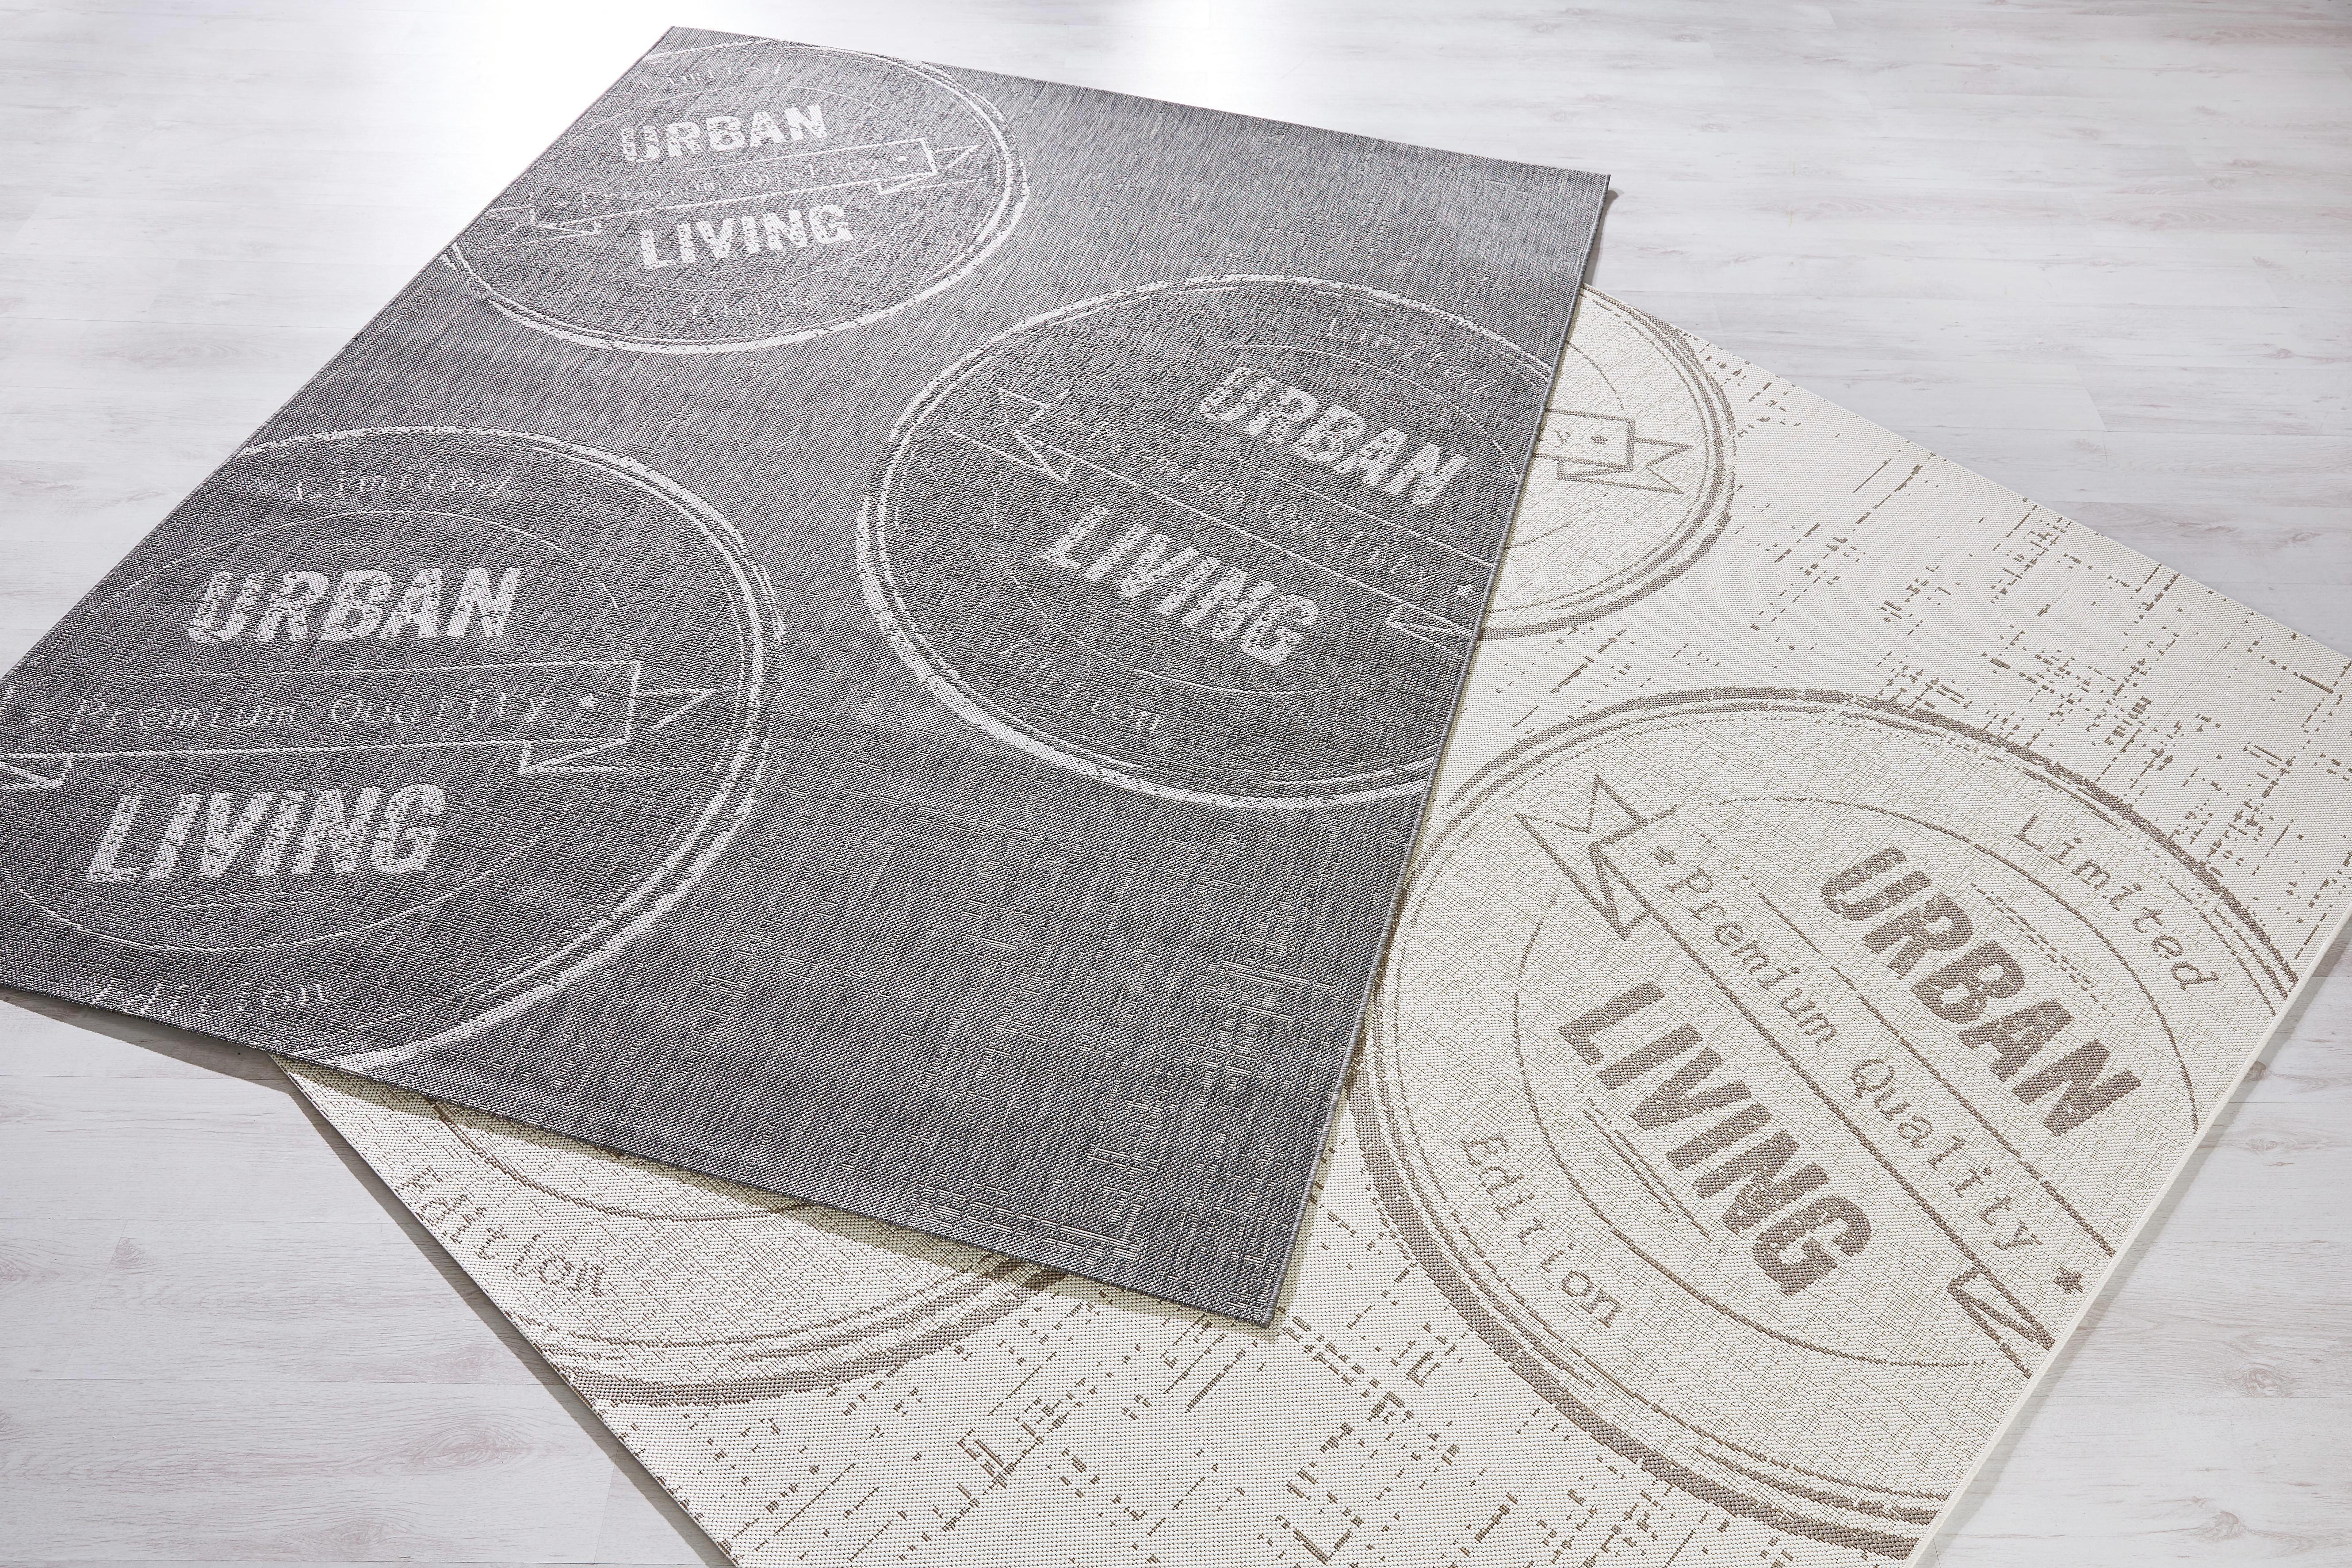 Síkszövet Szőnyeg Urban Living 1 - antracit, Lifestyle (80/200cm) - MÖMAX modern living